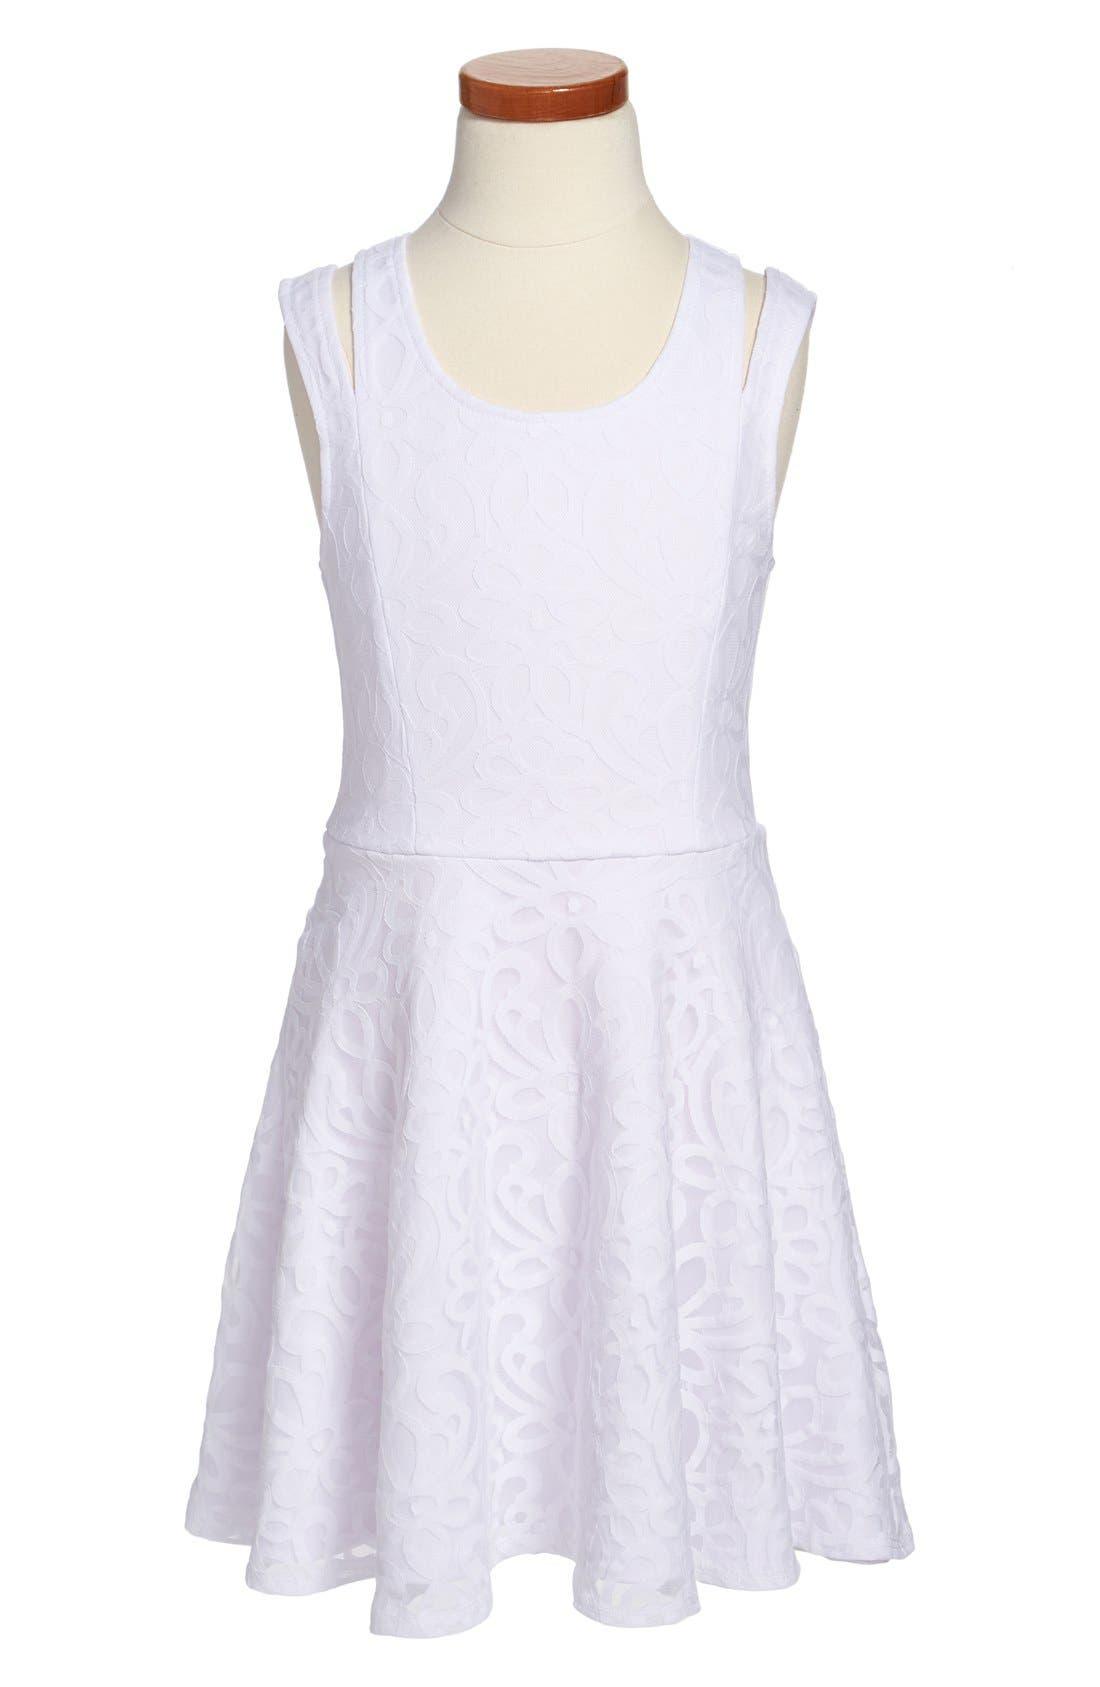 Alternate Image 1 Selected - Sally Miller 'Soutache' Sleeveless Dress (Big Girls)